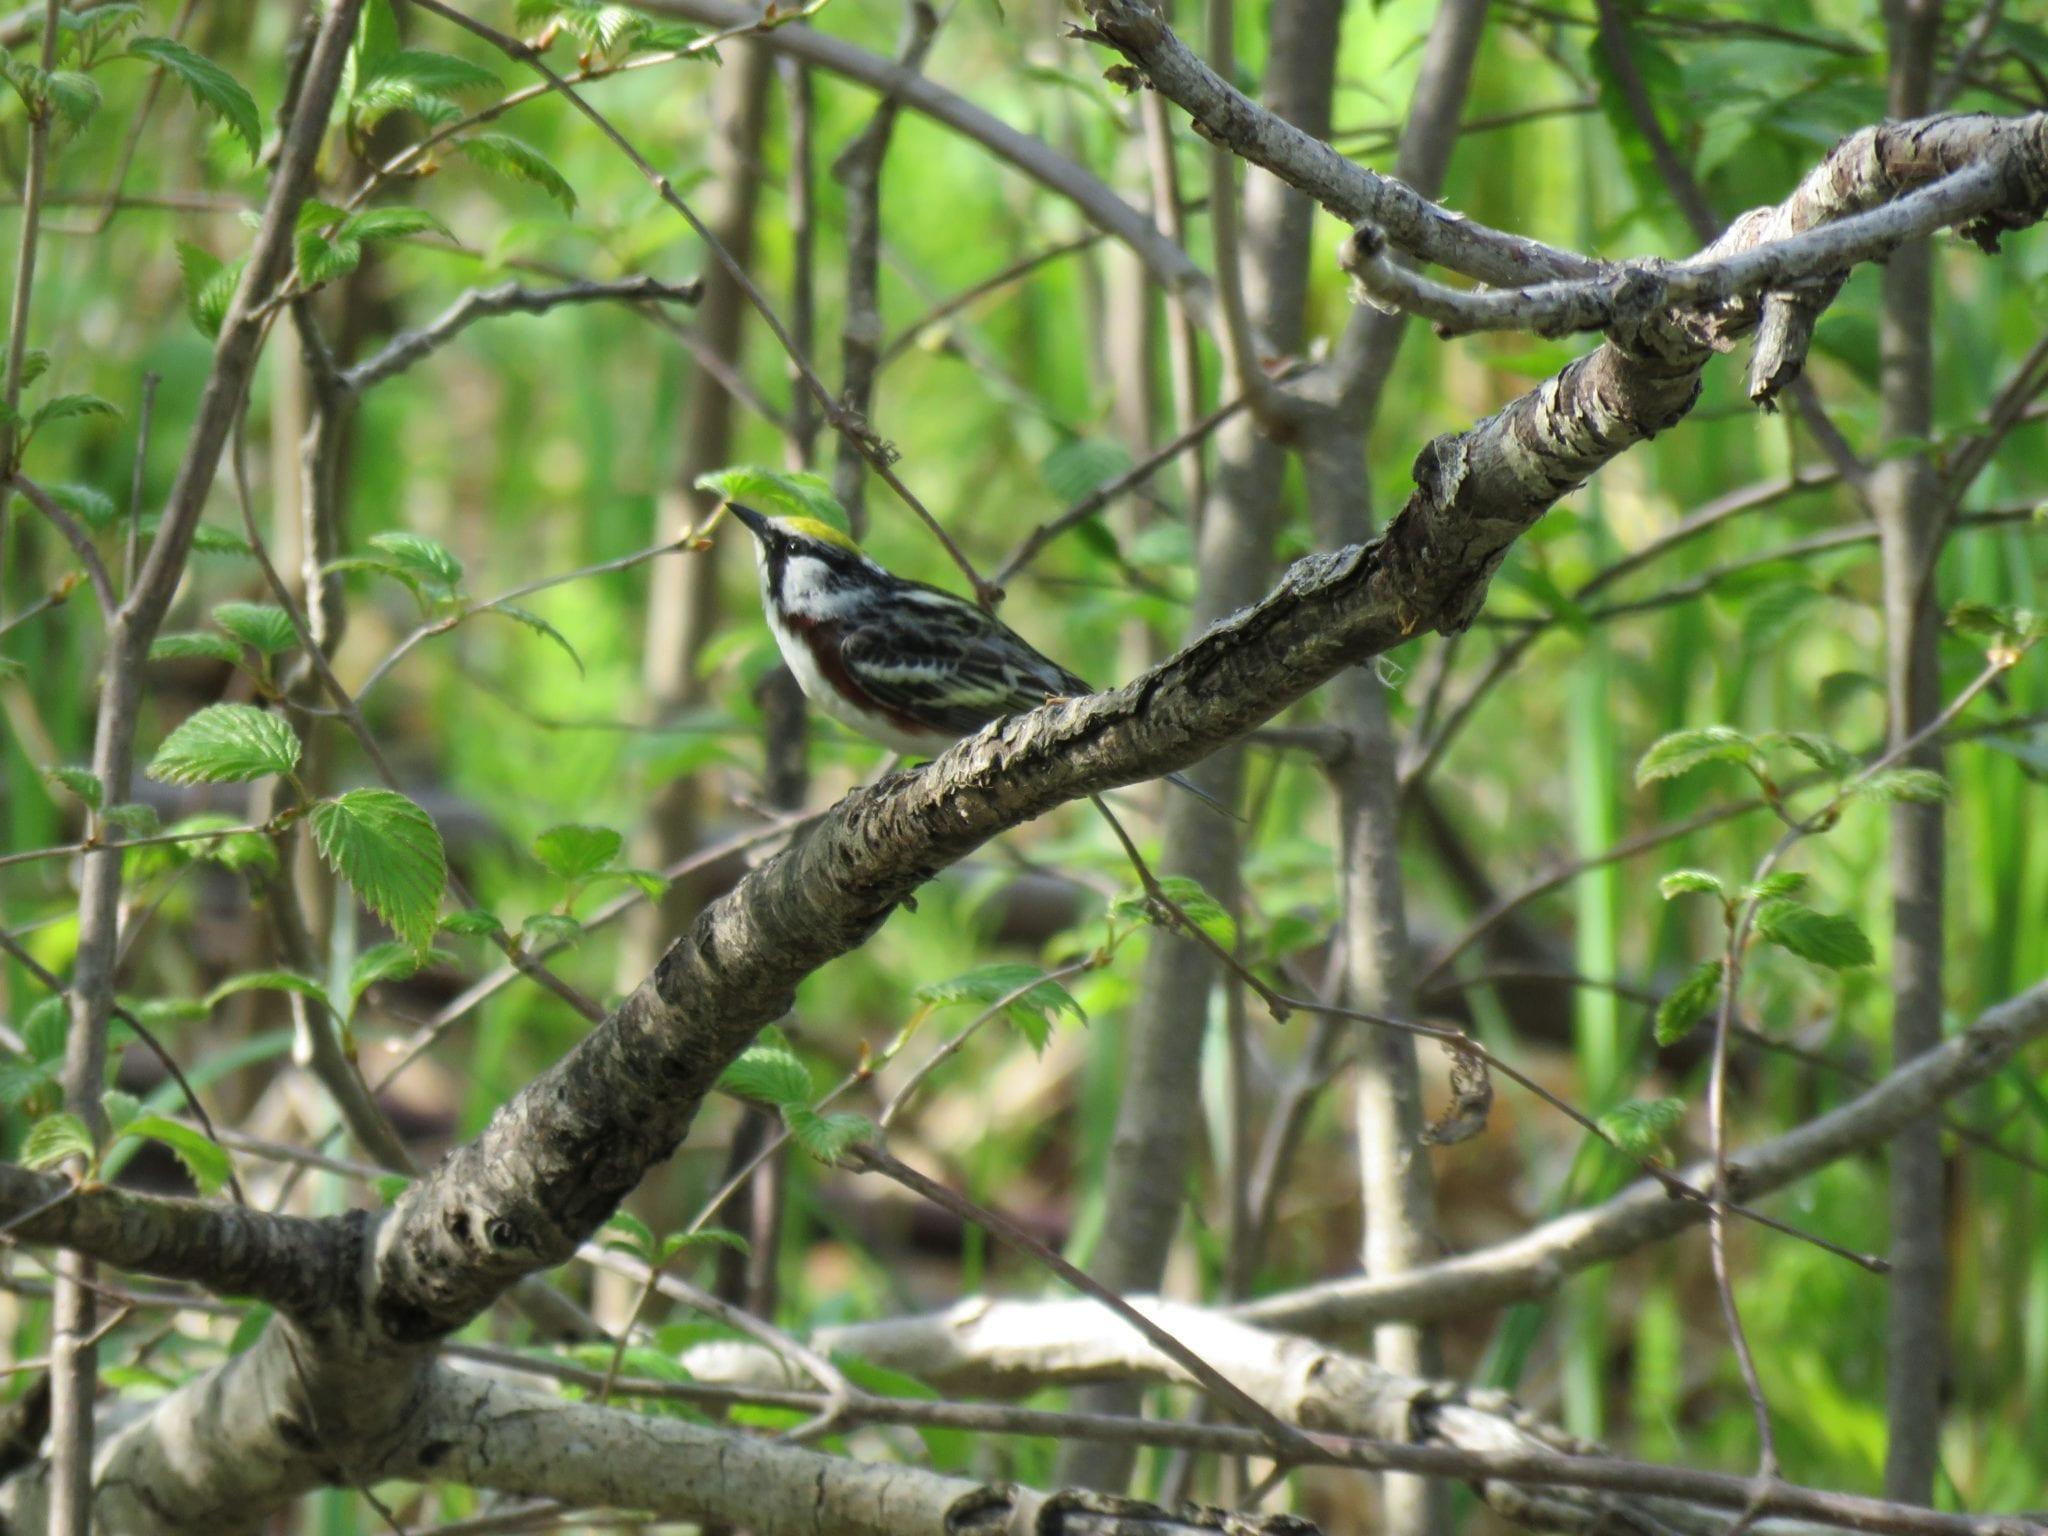 Green Maine birding